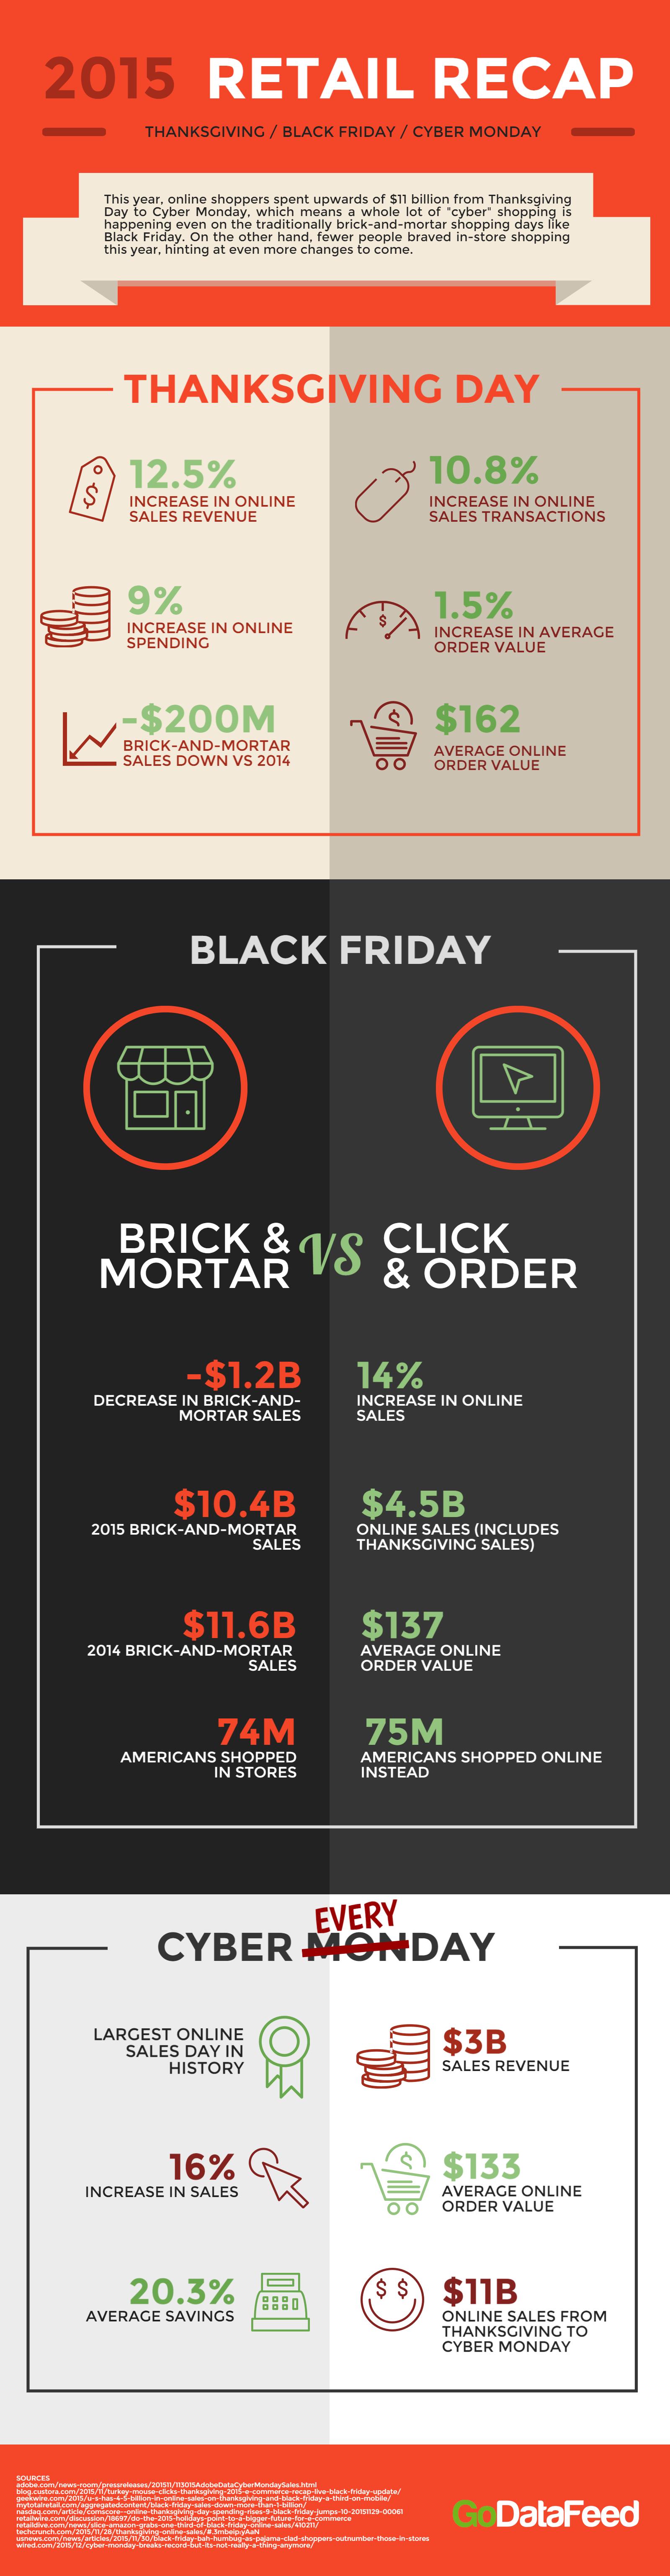 2015 Retail Recap Black Friday Cyber Monday Web